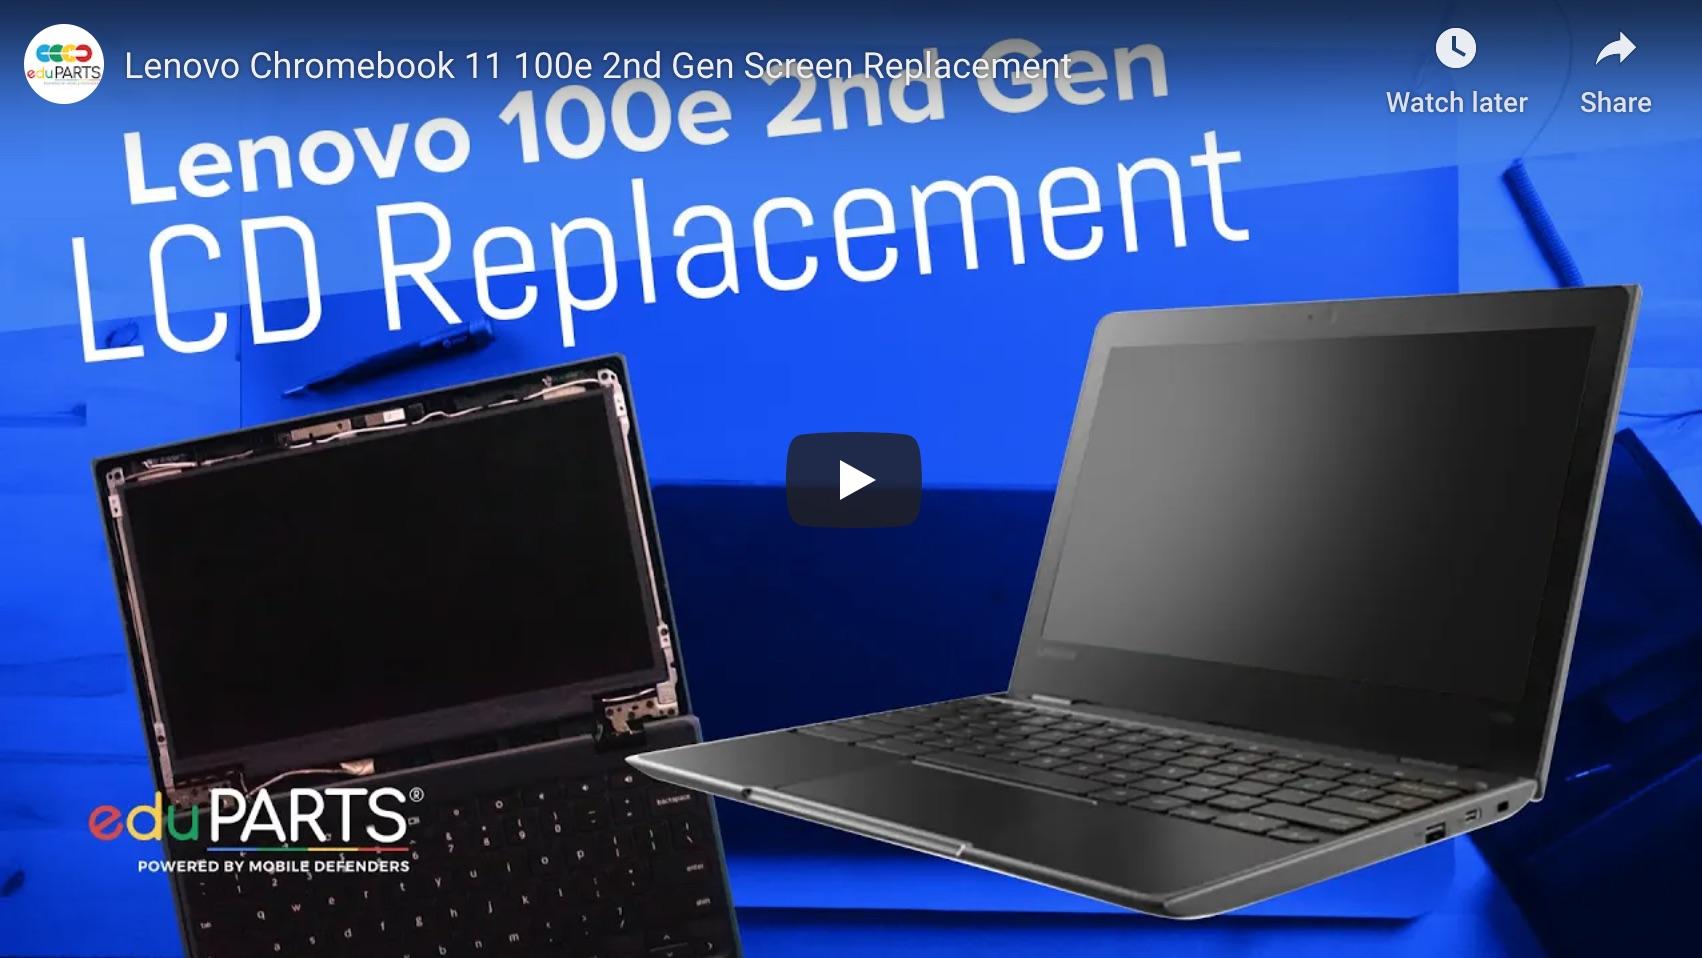 Video of Lenovo Chromebook Teardown